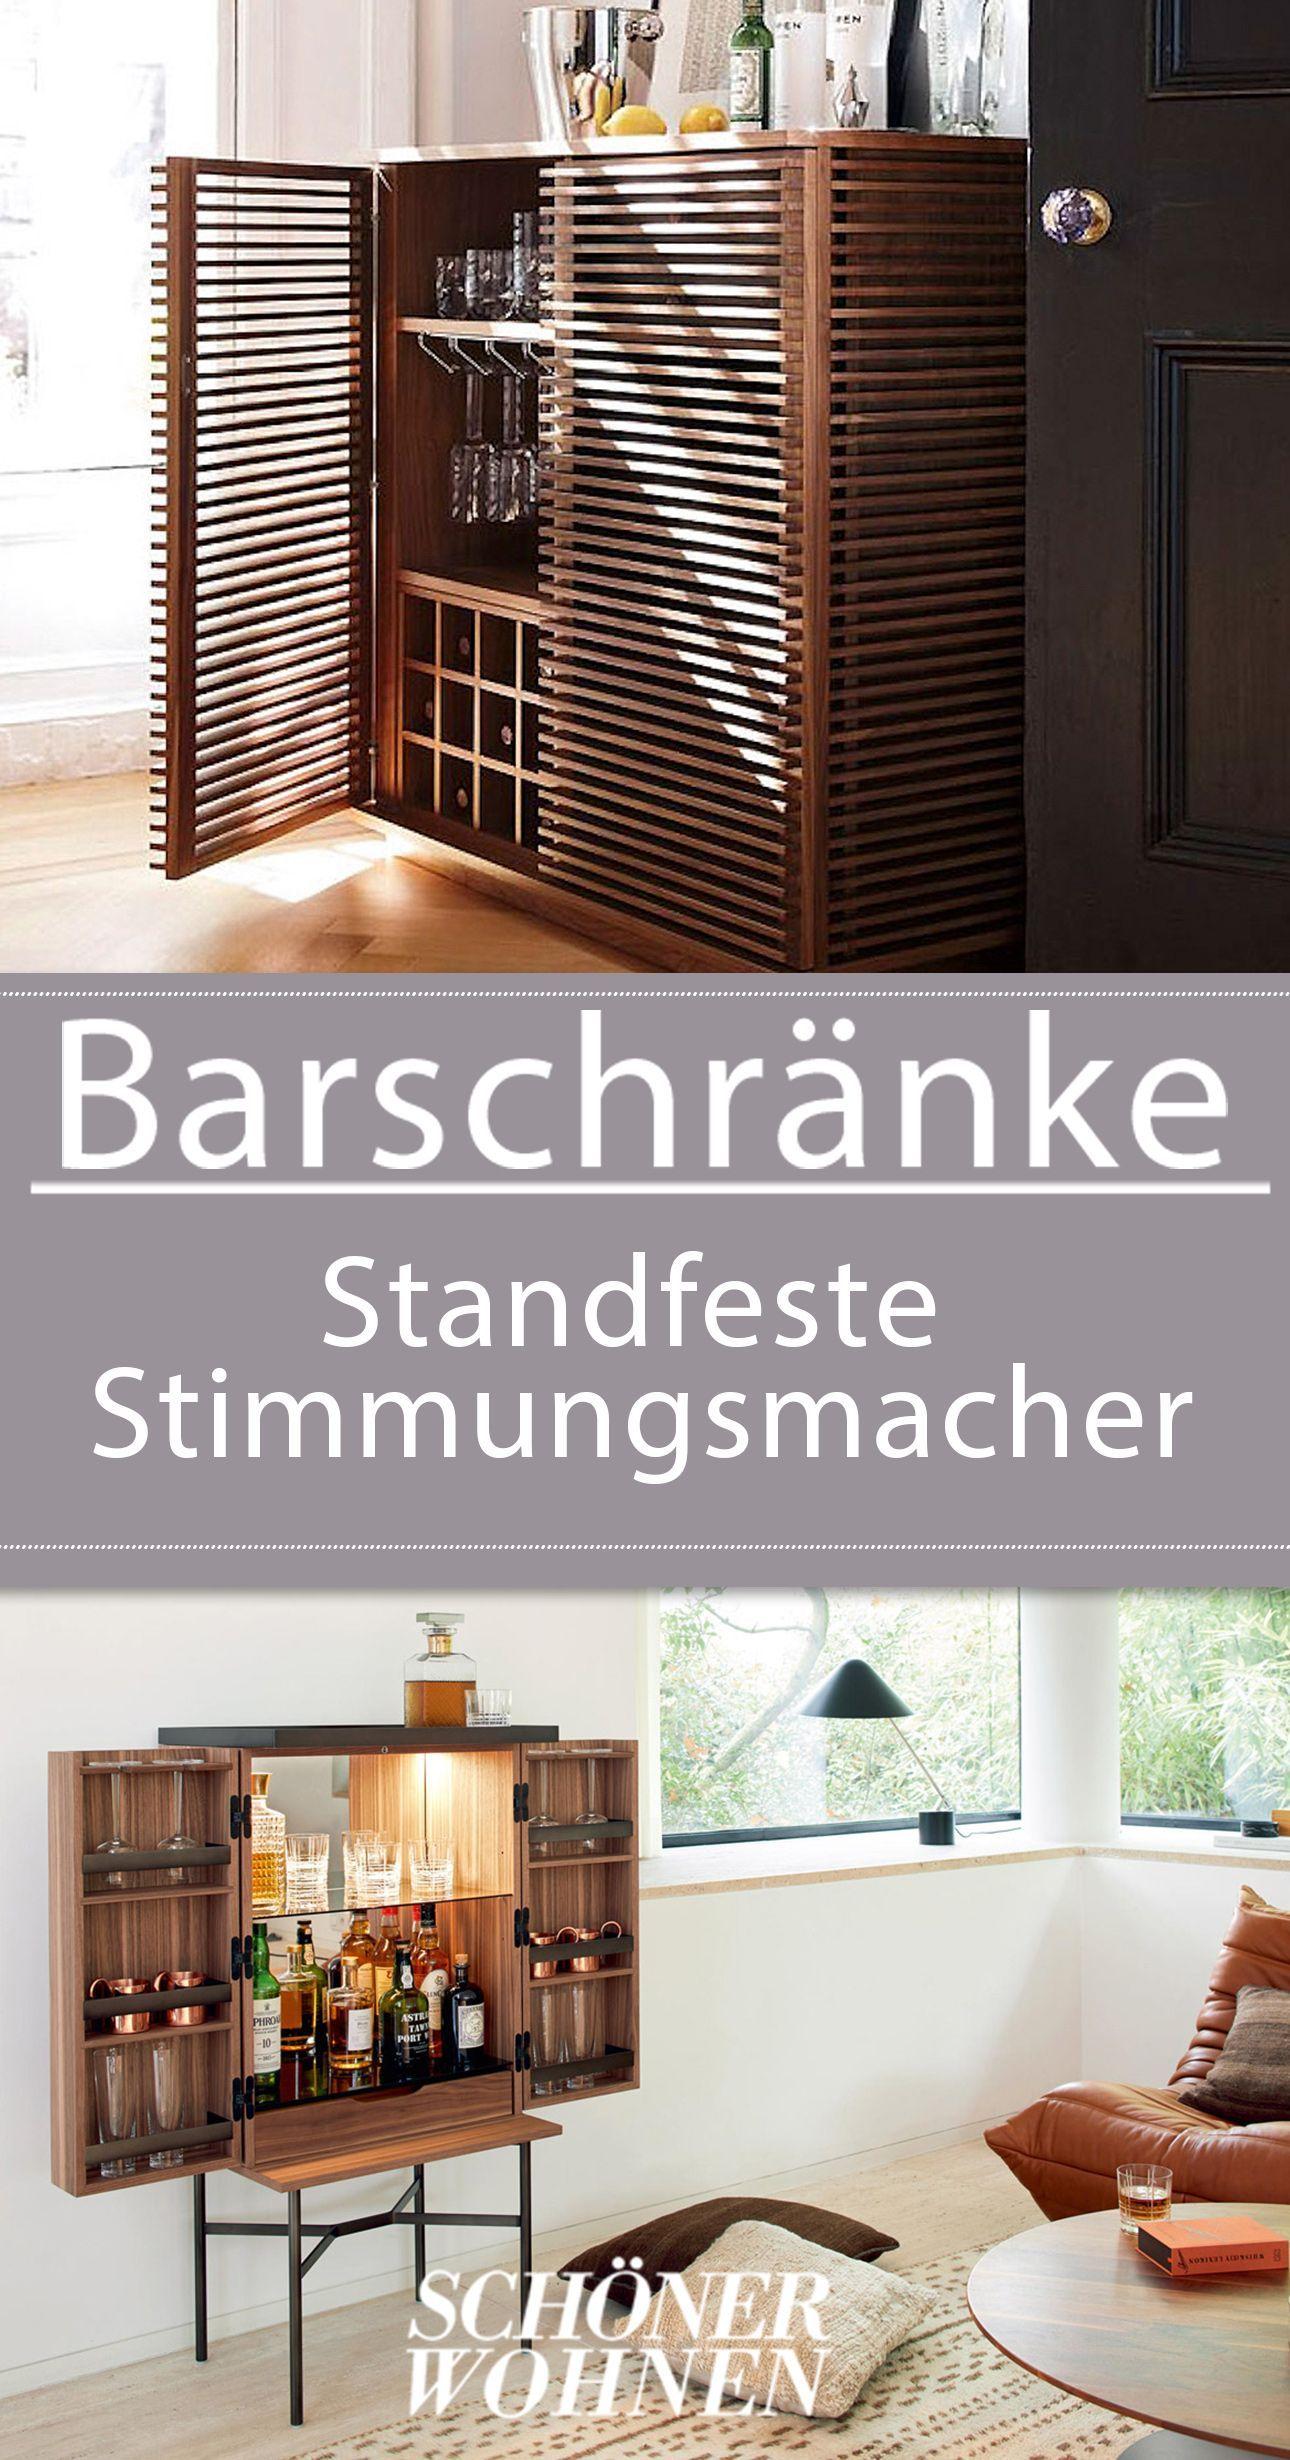 Barschrank